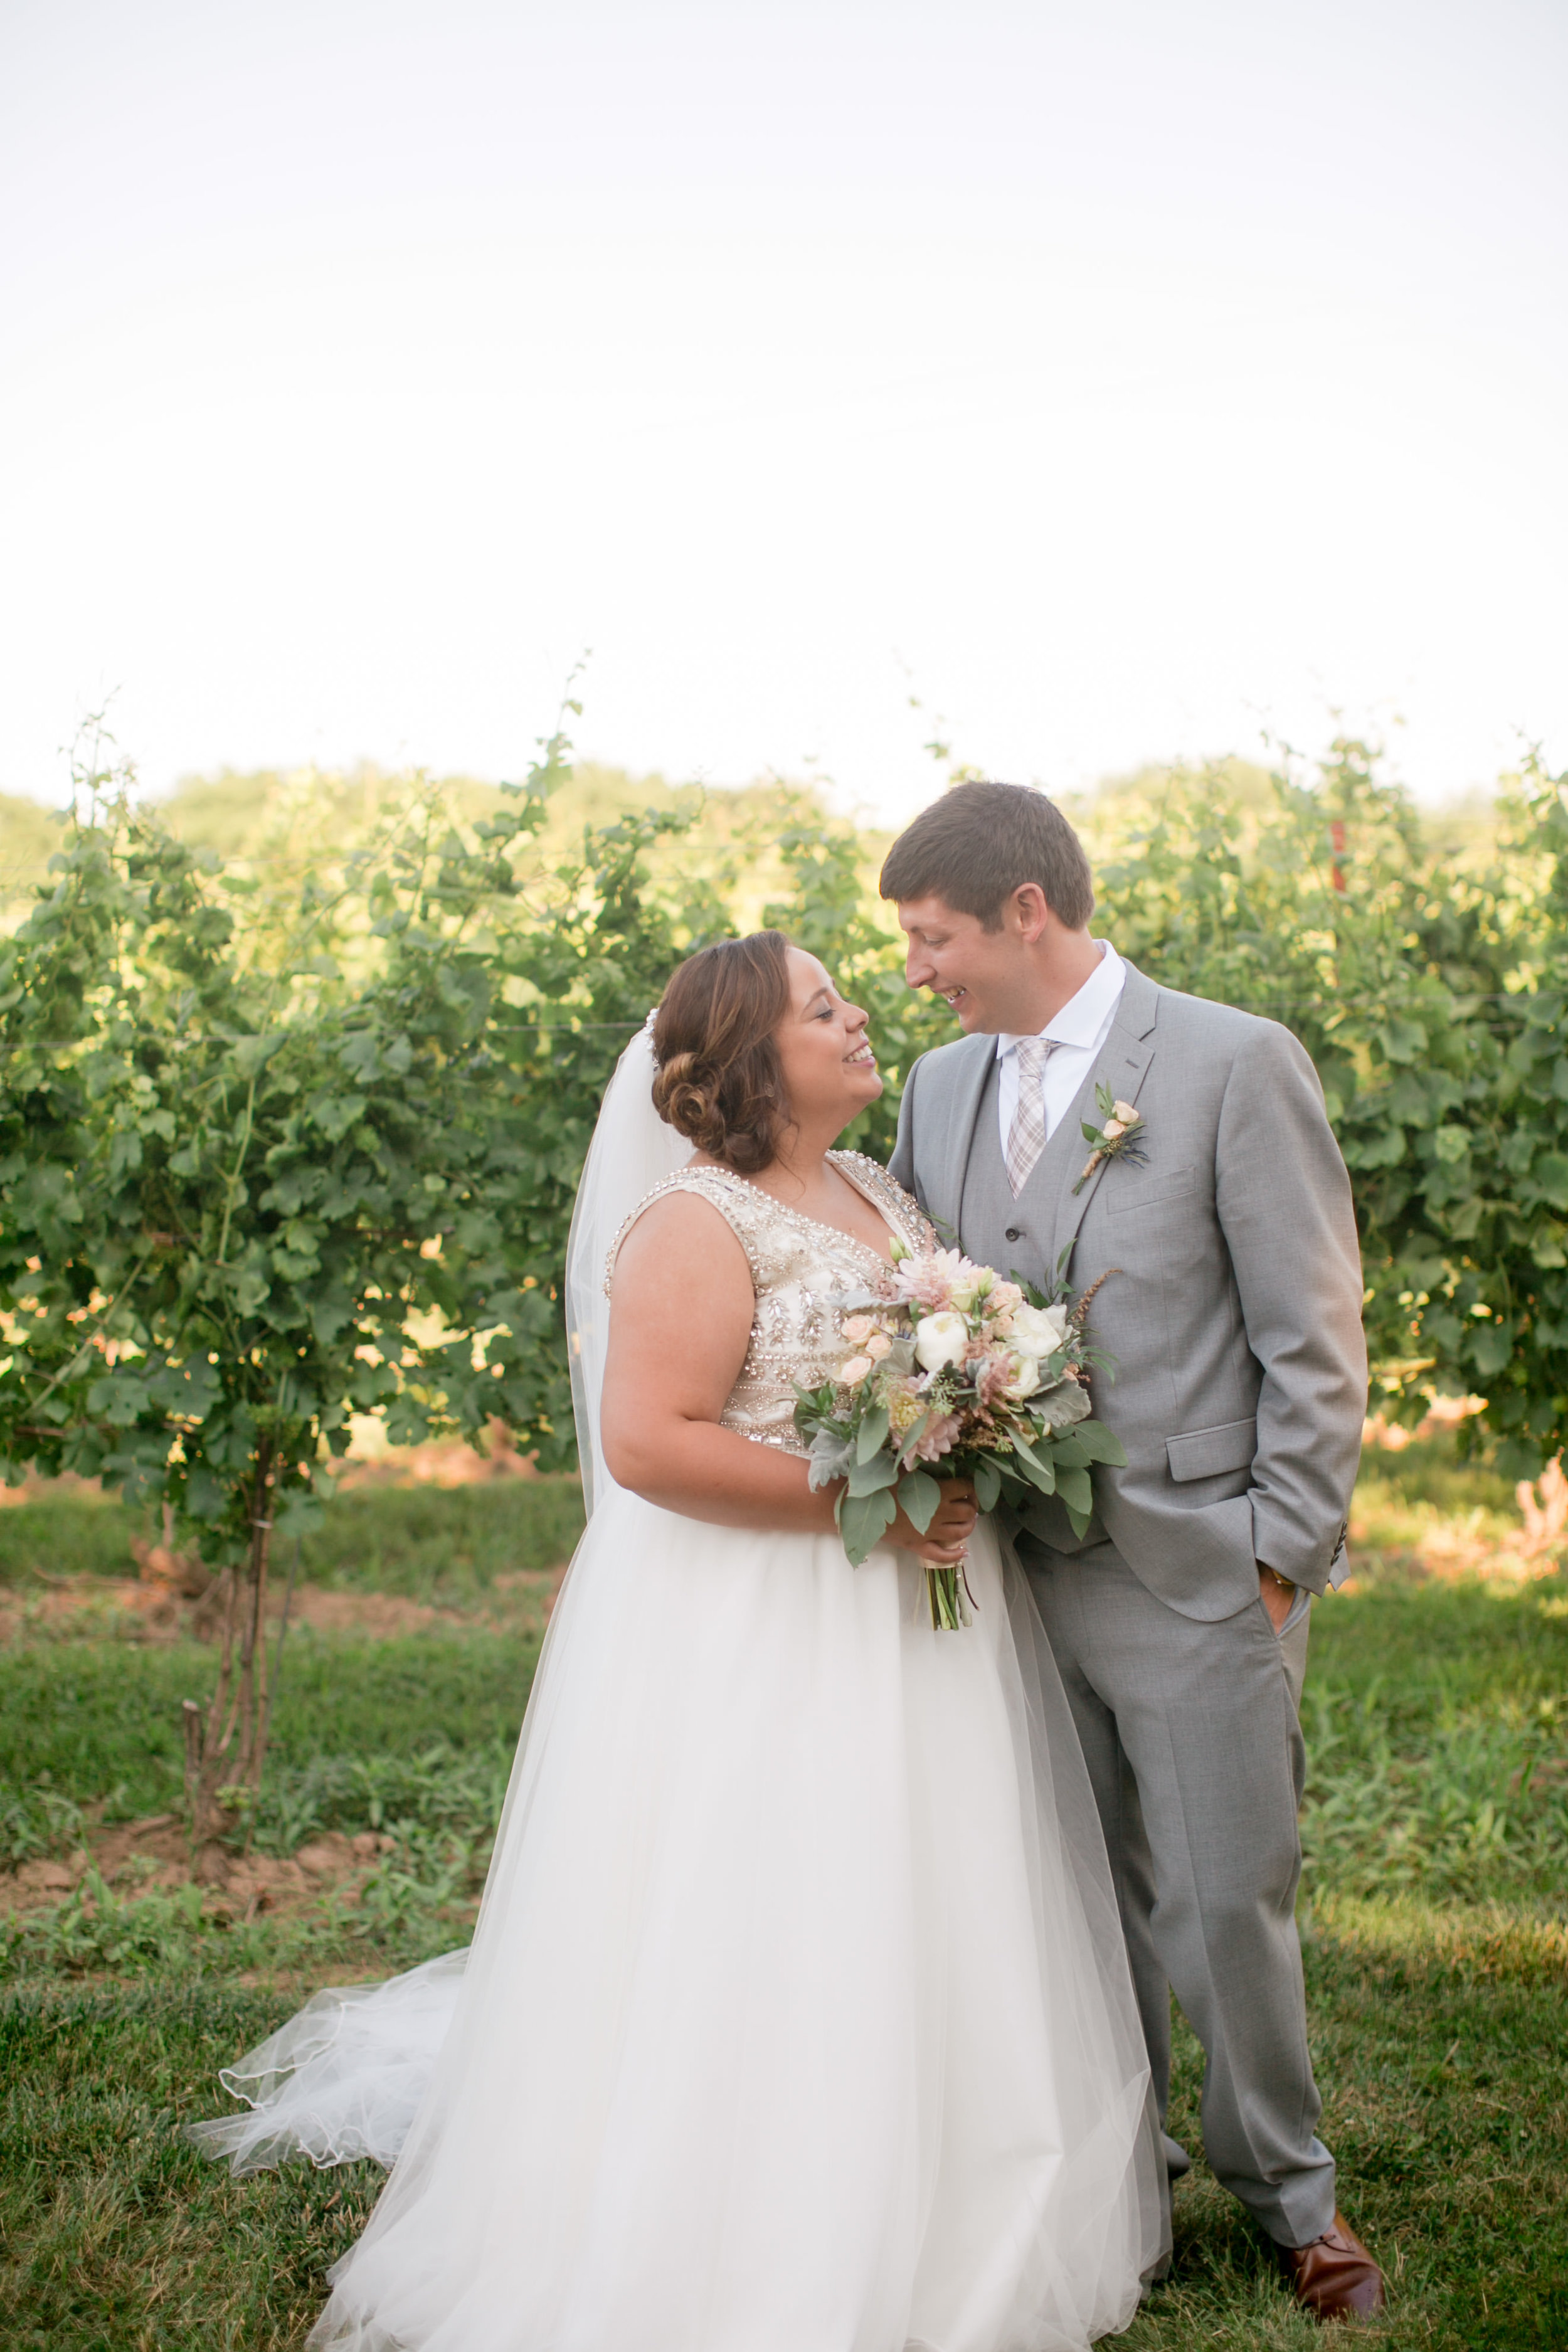 Kimberley + Cameron - Daniel Ricci Weddings - High Res. Finals-374.jpg